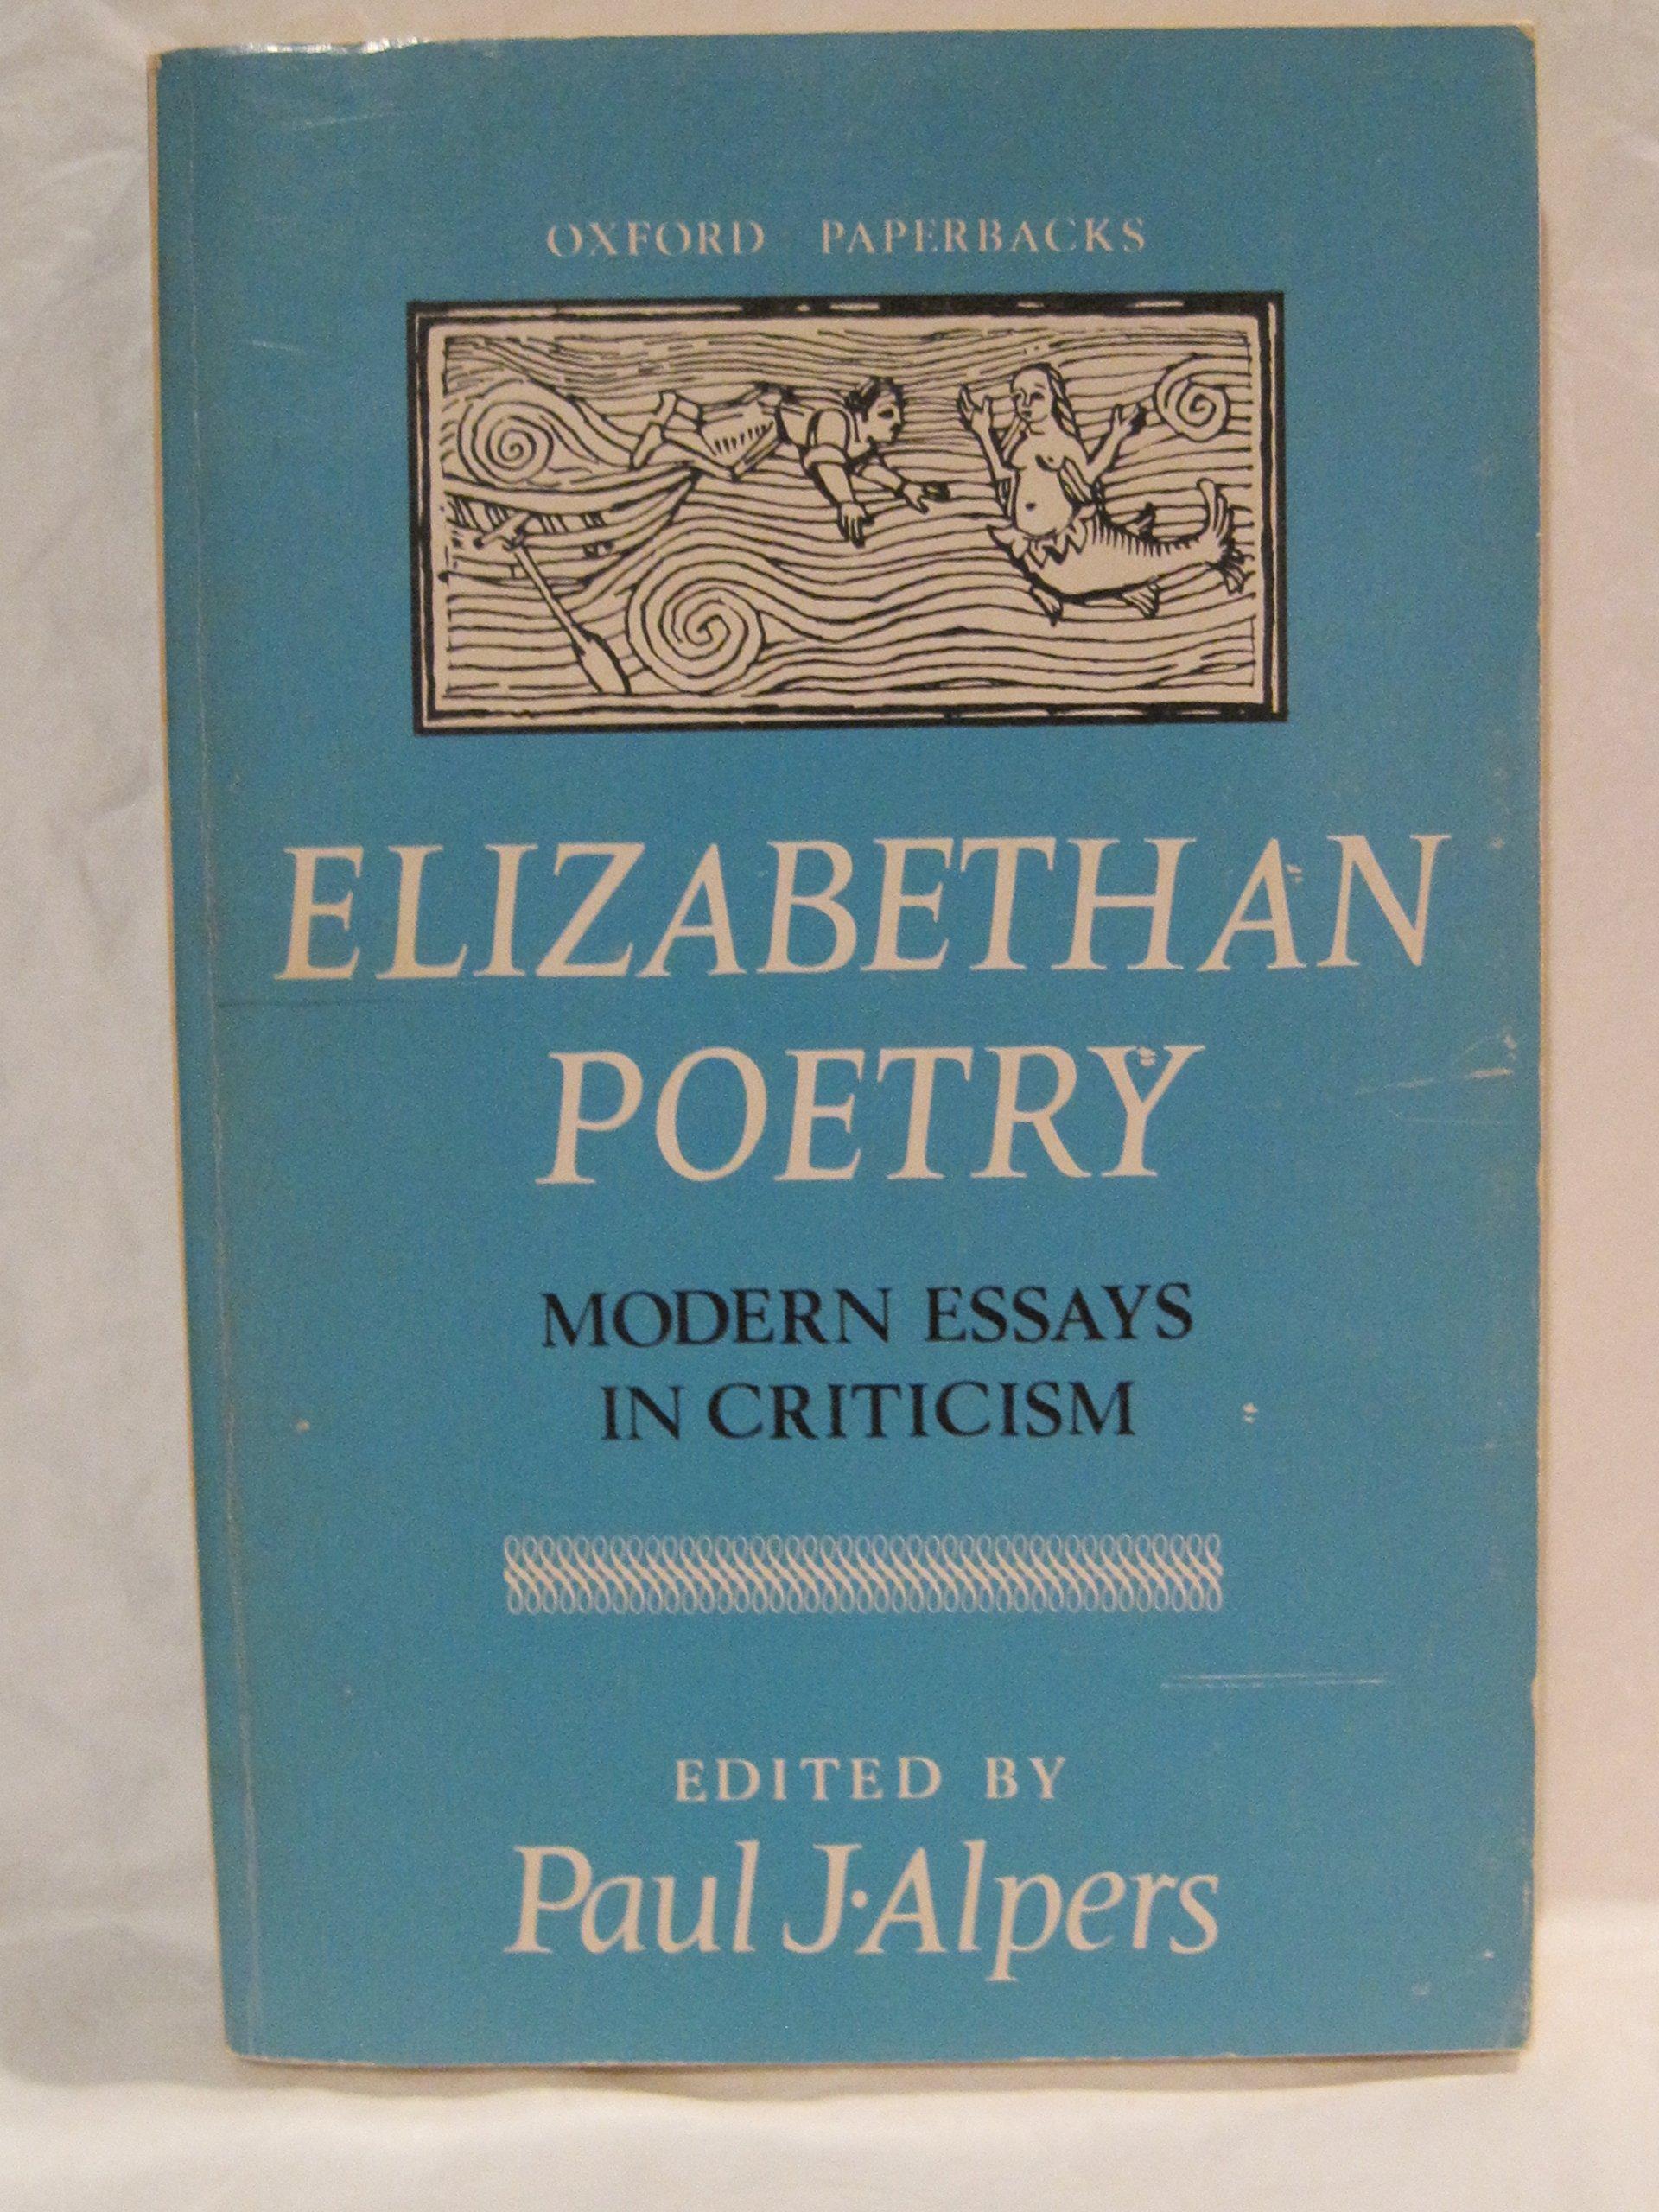 elizabethan poetry modern essays in criticism alpers paul j ed elizabethan poetry modern essays in criticism alpers paul j ed com books